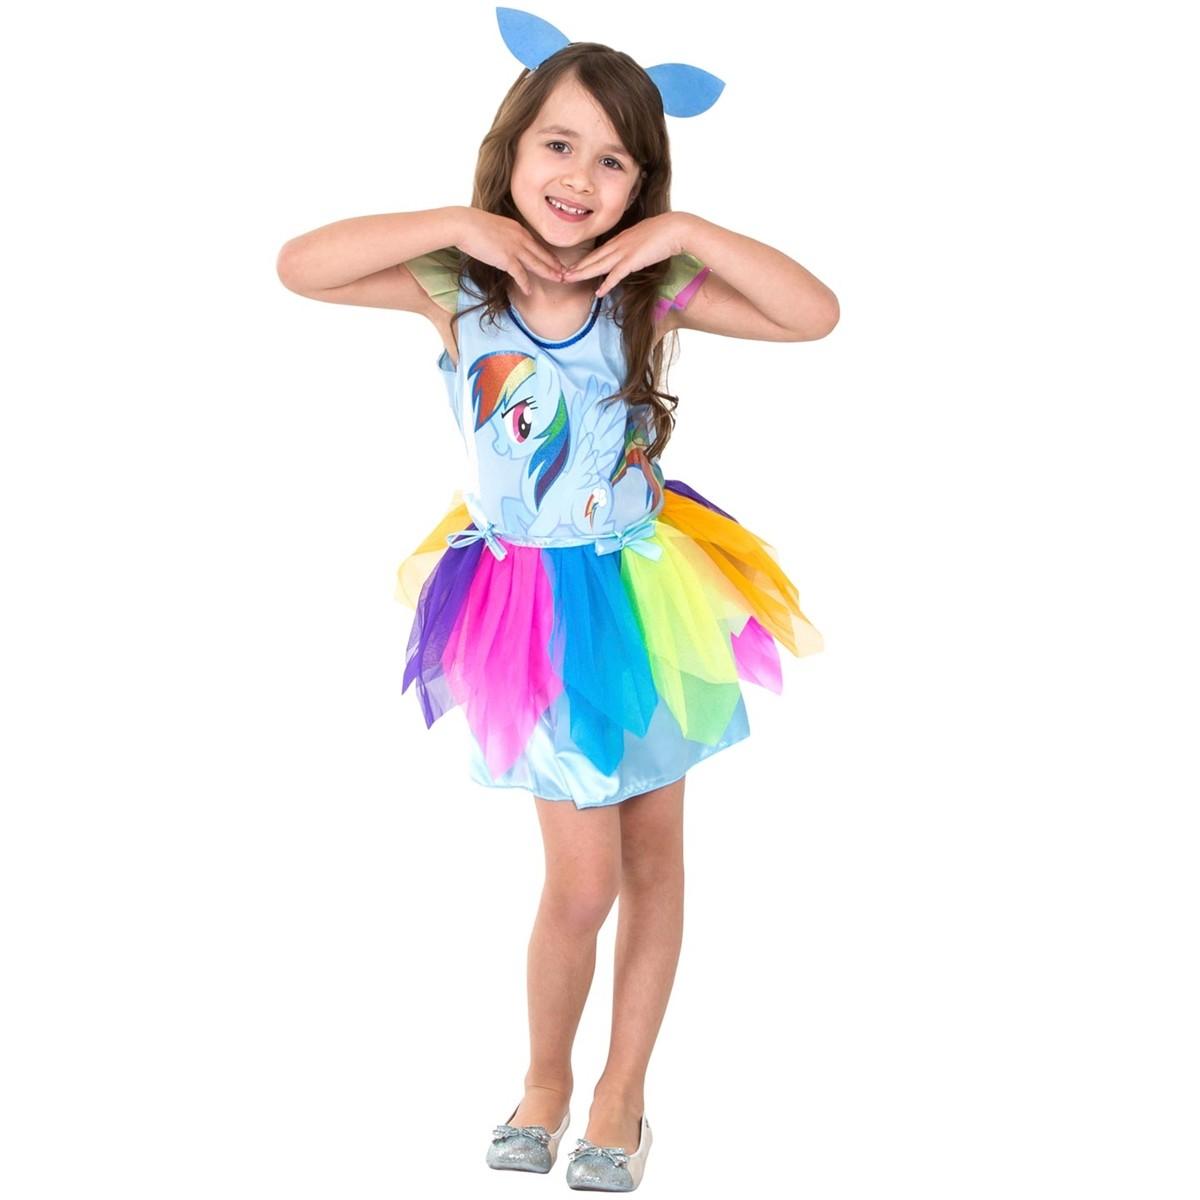 Fantasia Infantil Feminino: My Little Pony Pinkie Rainbow Dash - Rubies